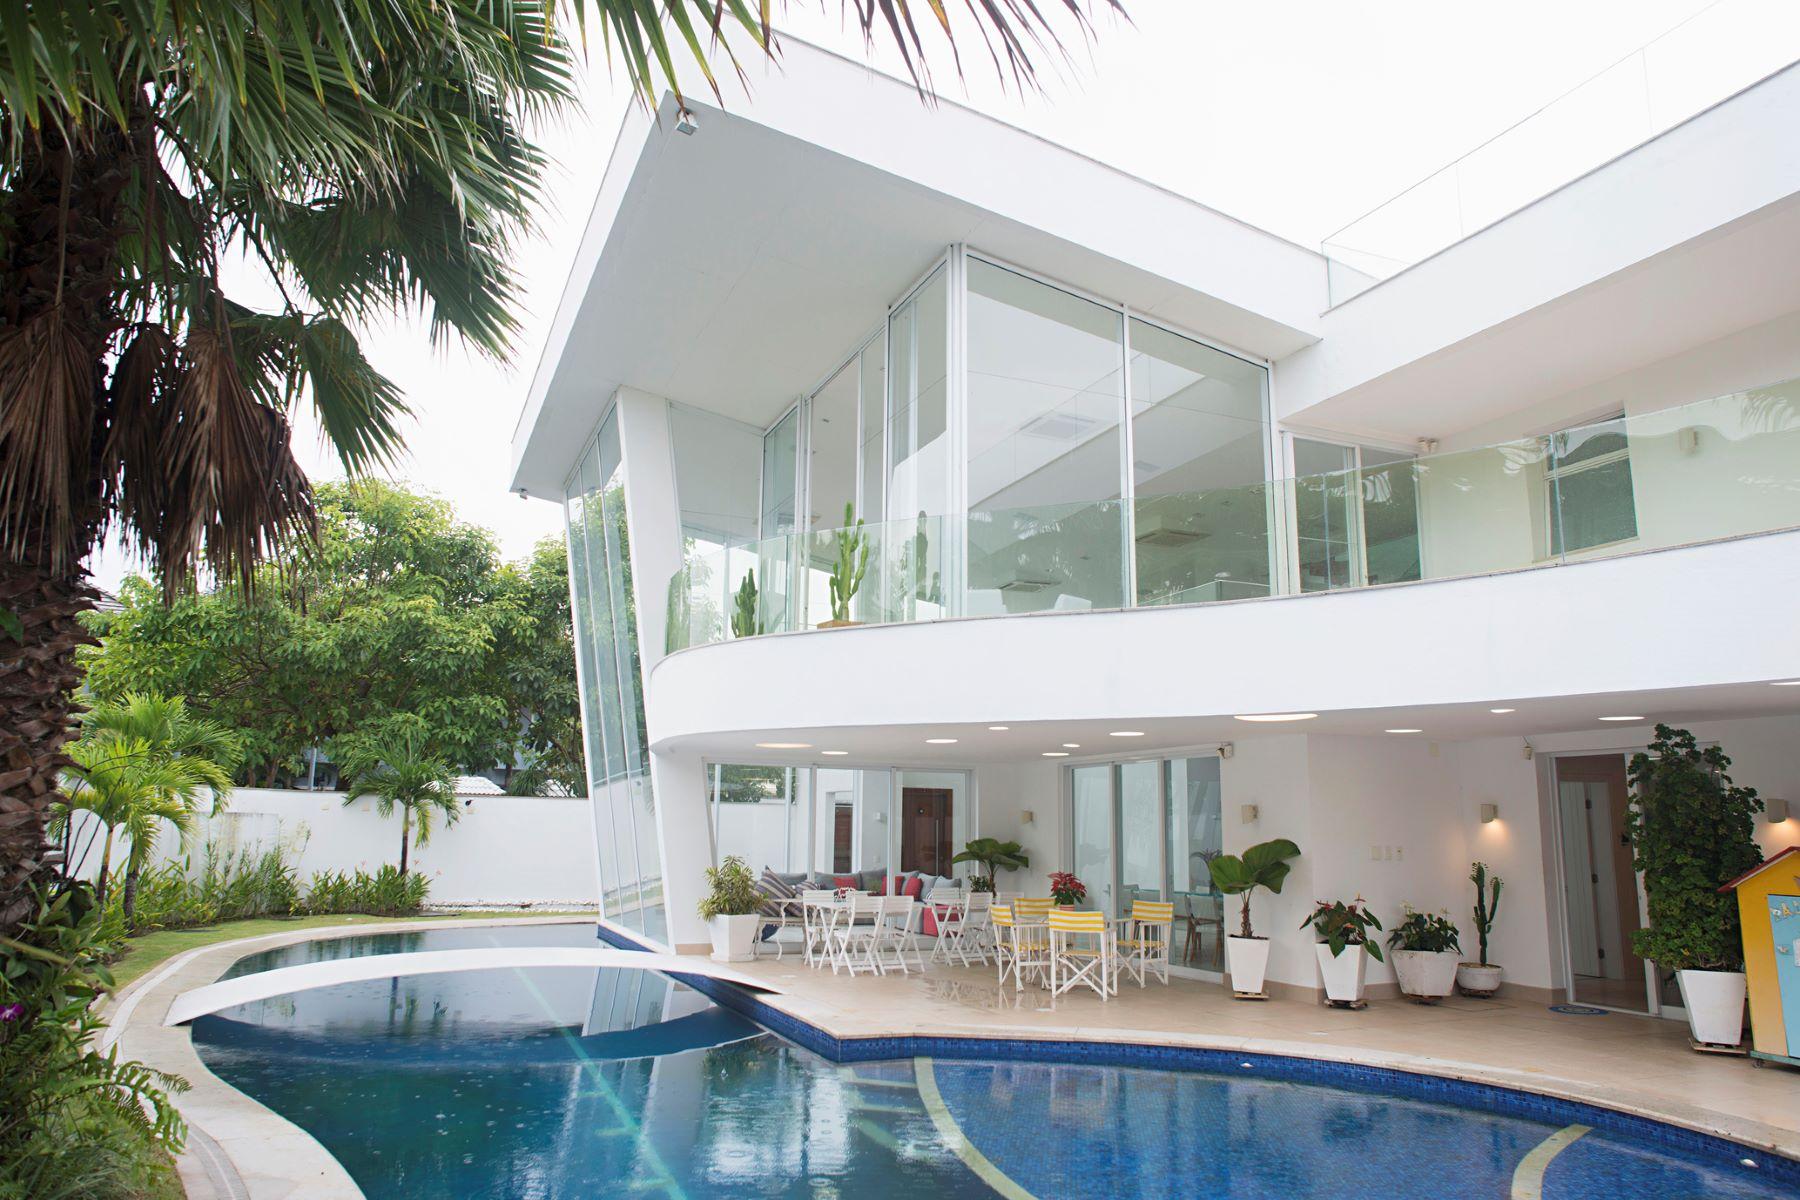 Maison unifamiliale pour l Vente à White House Rua Rachel de Queiroz Rio De Janeiro, Rio De Janeiro, 22793100 Brésil